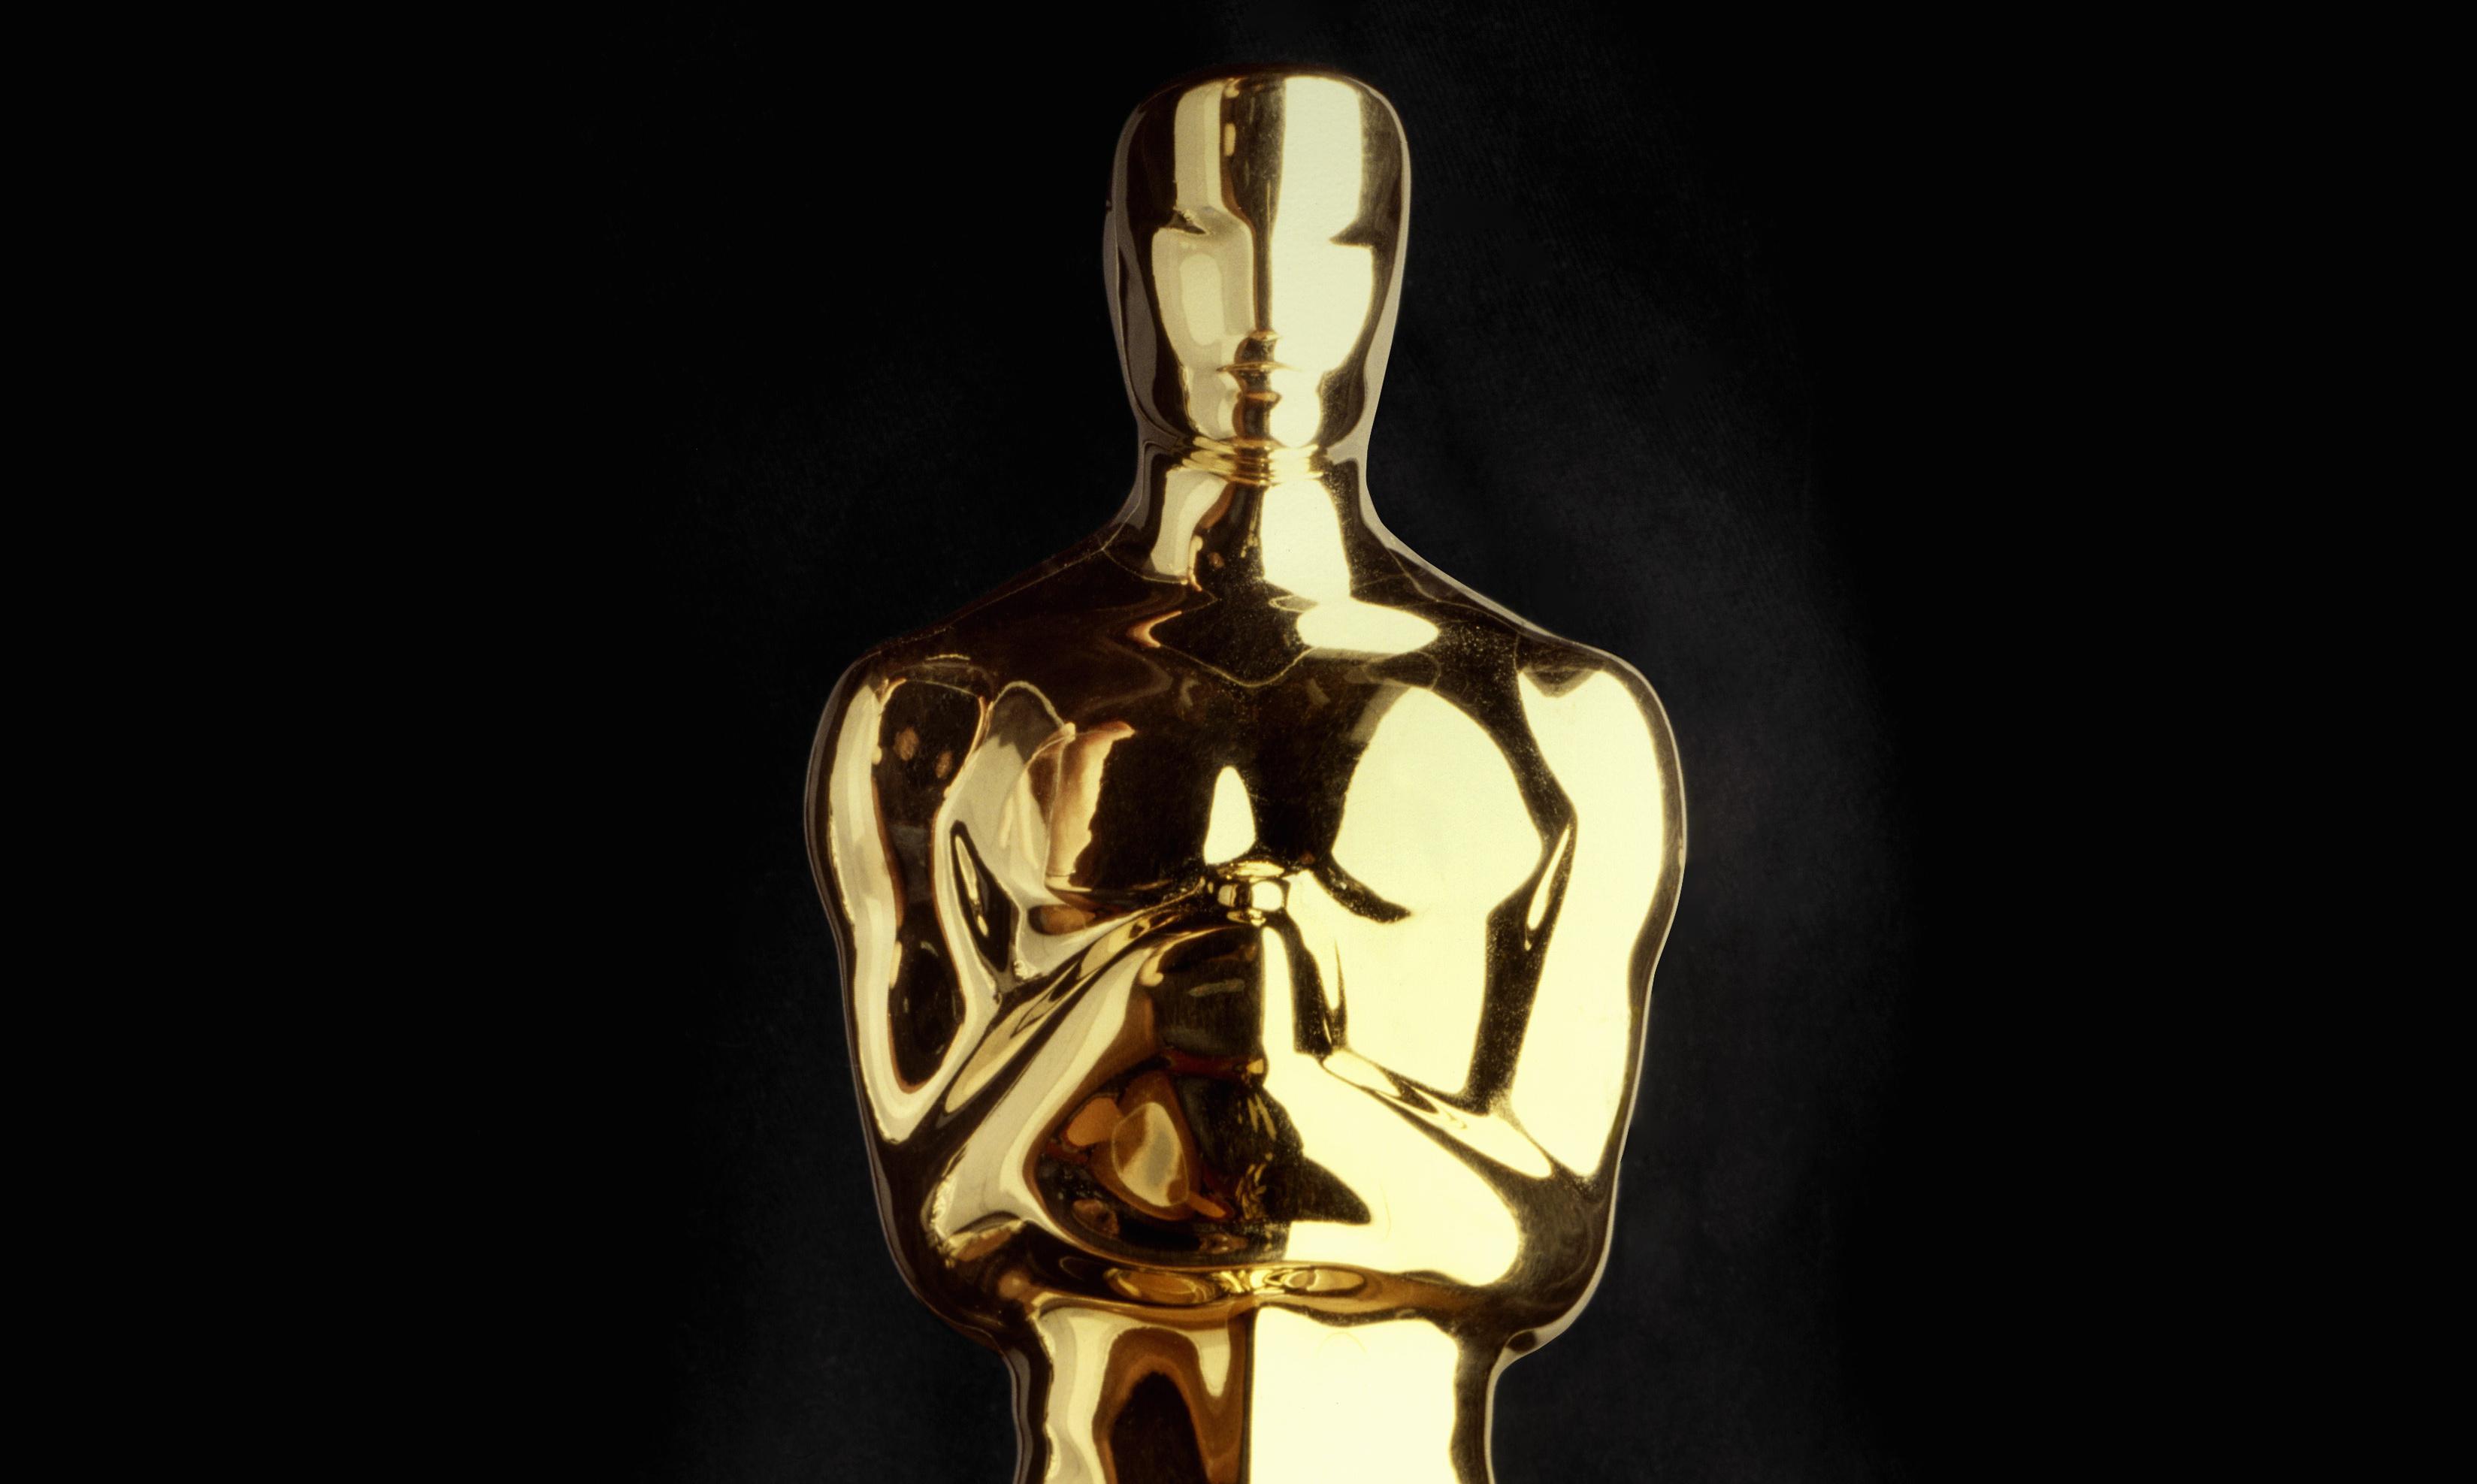 Kevin Hart rules himself out of Oscars hosting return